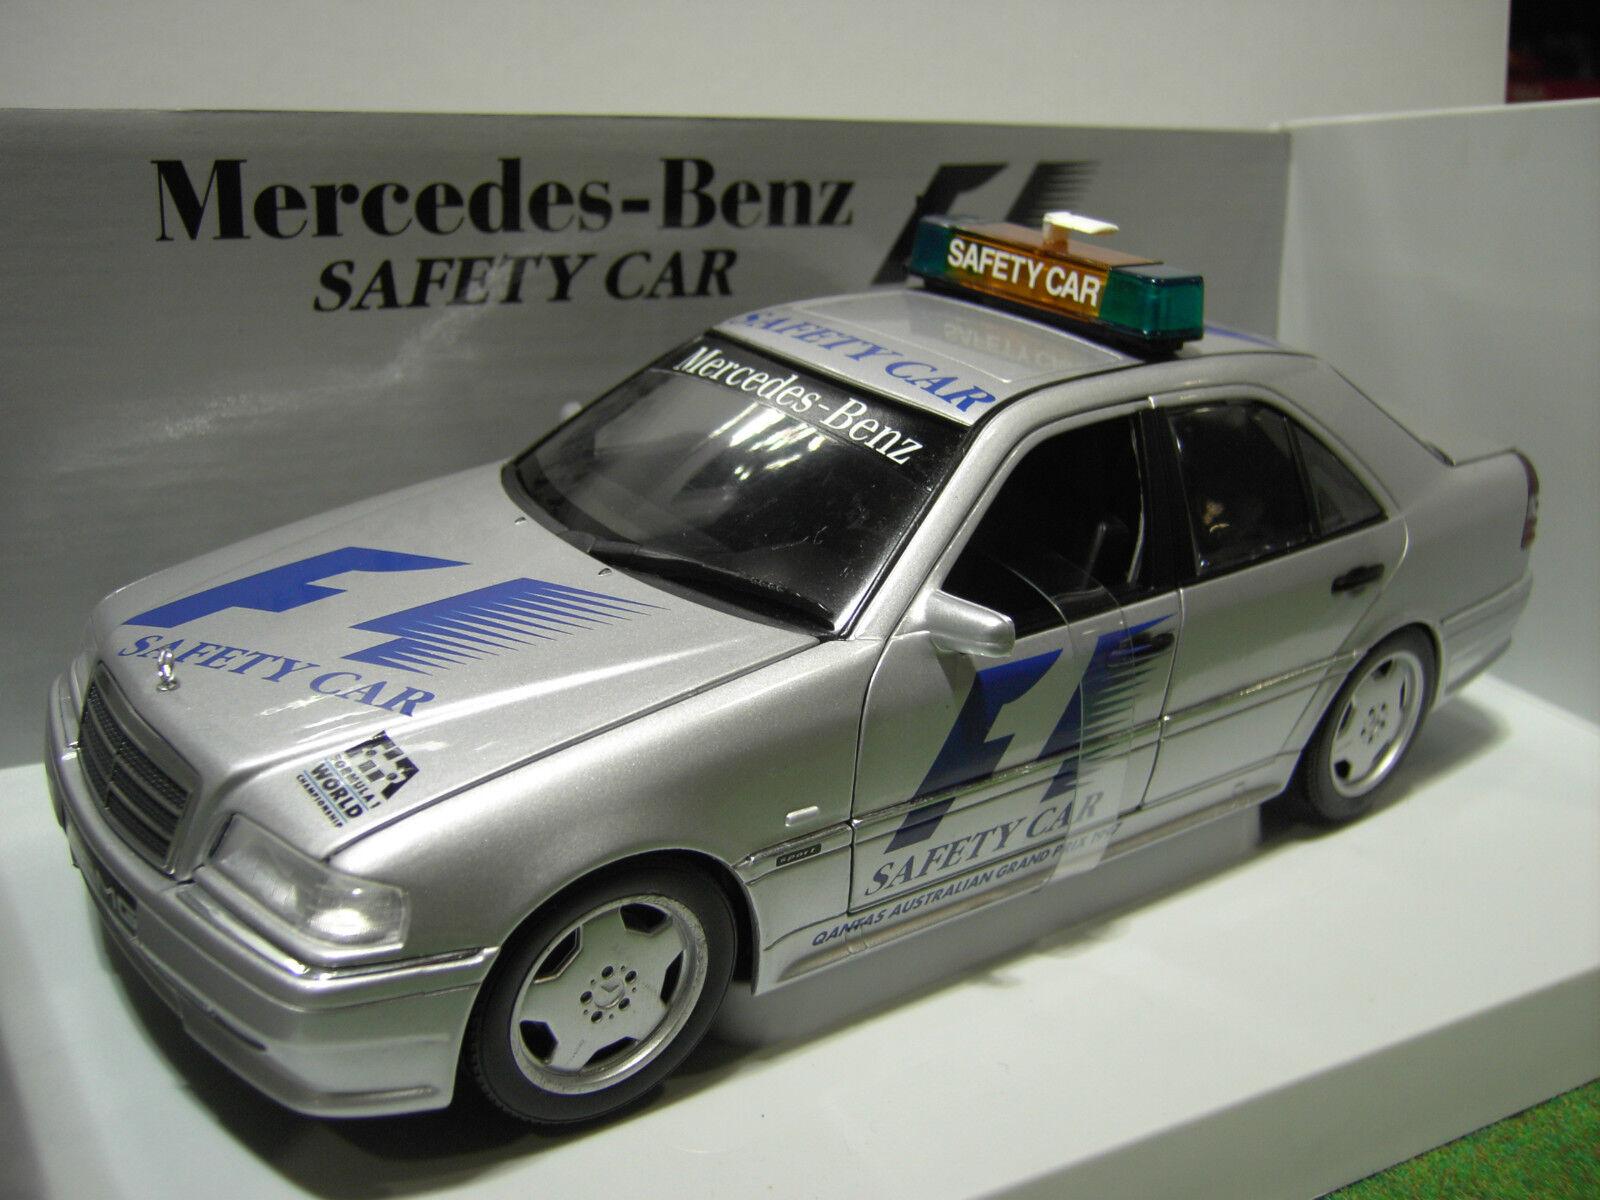 MERCEDES BENZ C CLASS AMG SAFETY CAR au 1 18 UT Models 26105 voiture miniature